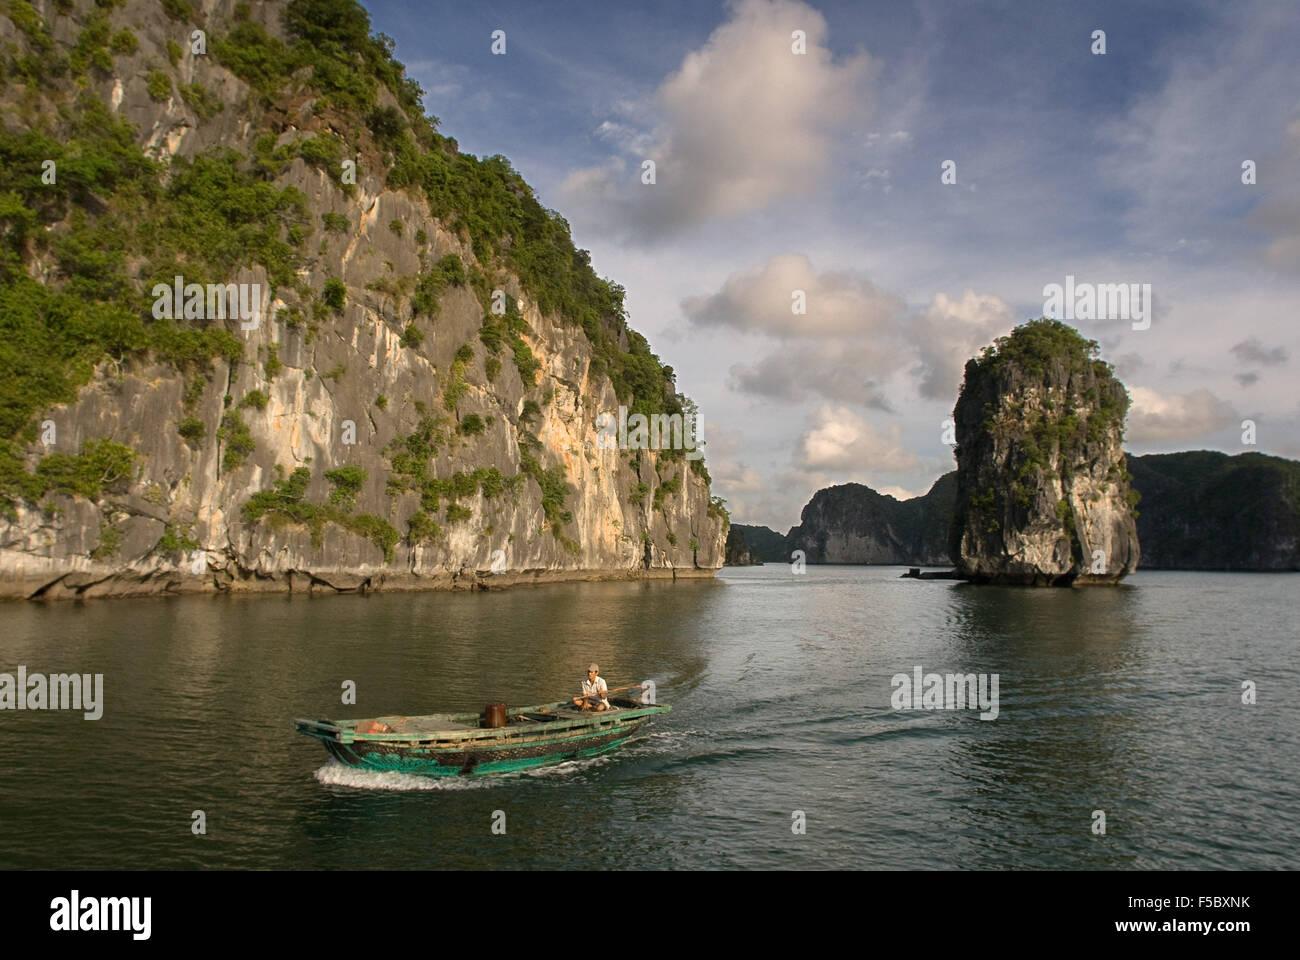 Boat and limestone karst in Ha long,Halong Bay, Vietnam,Ha long,Halong Bay, Vietnam - Stock Image